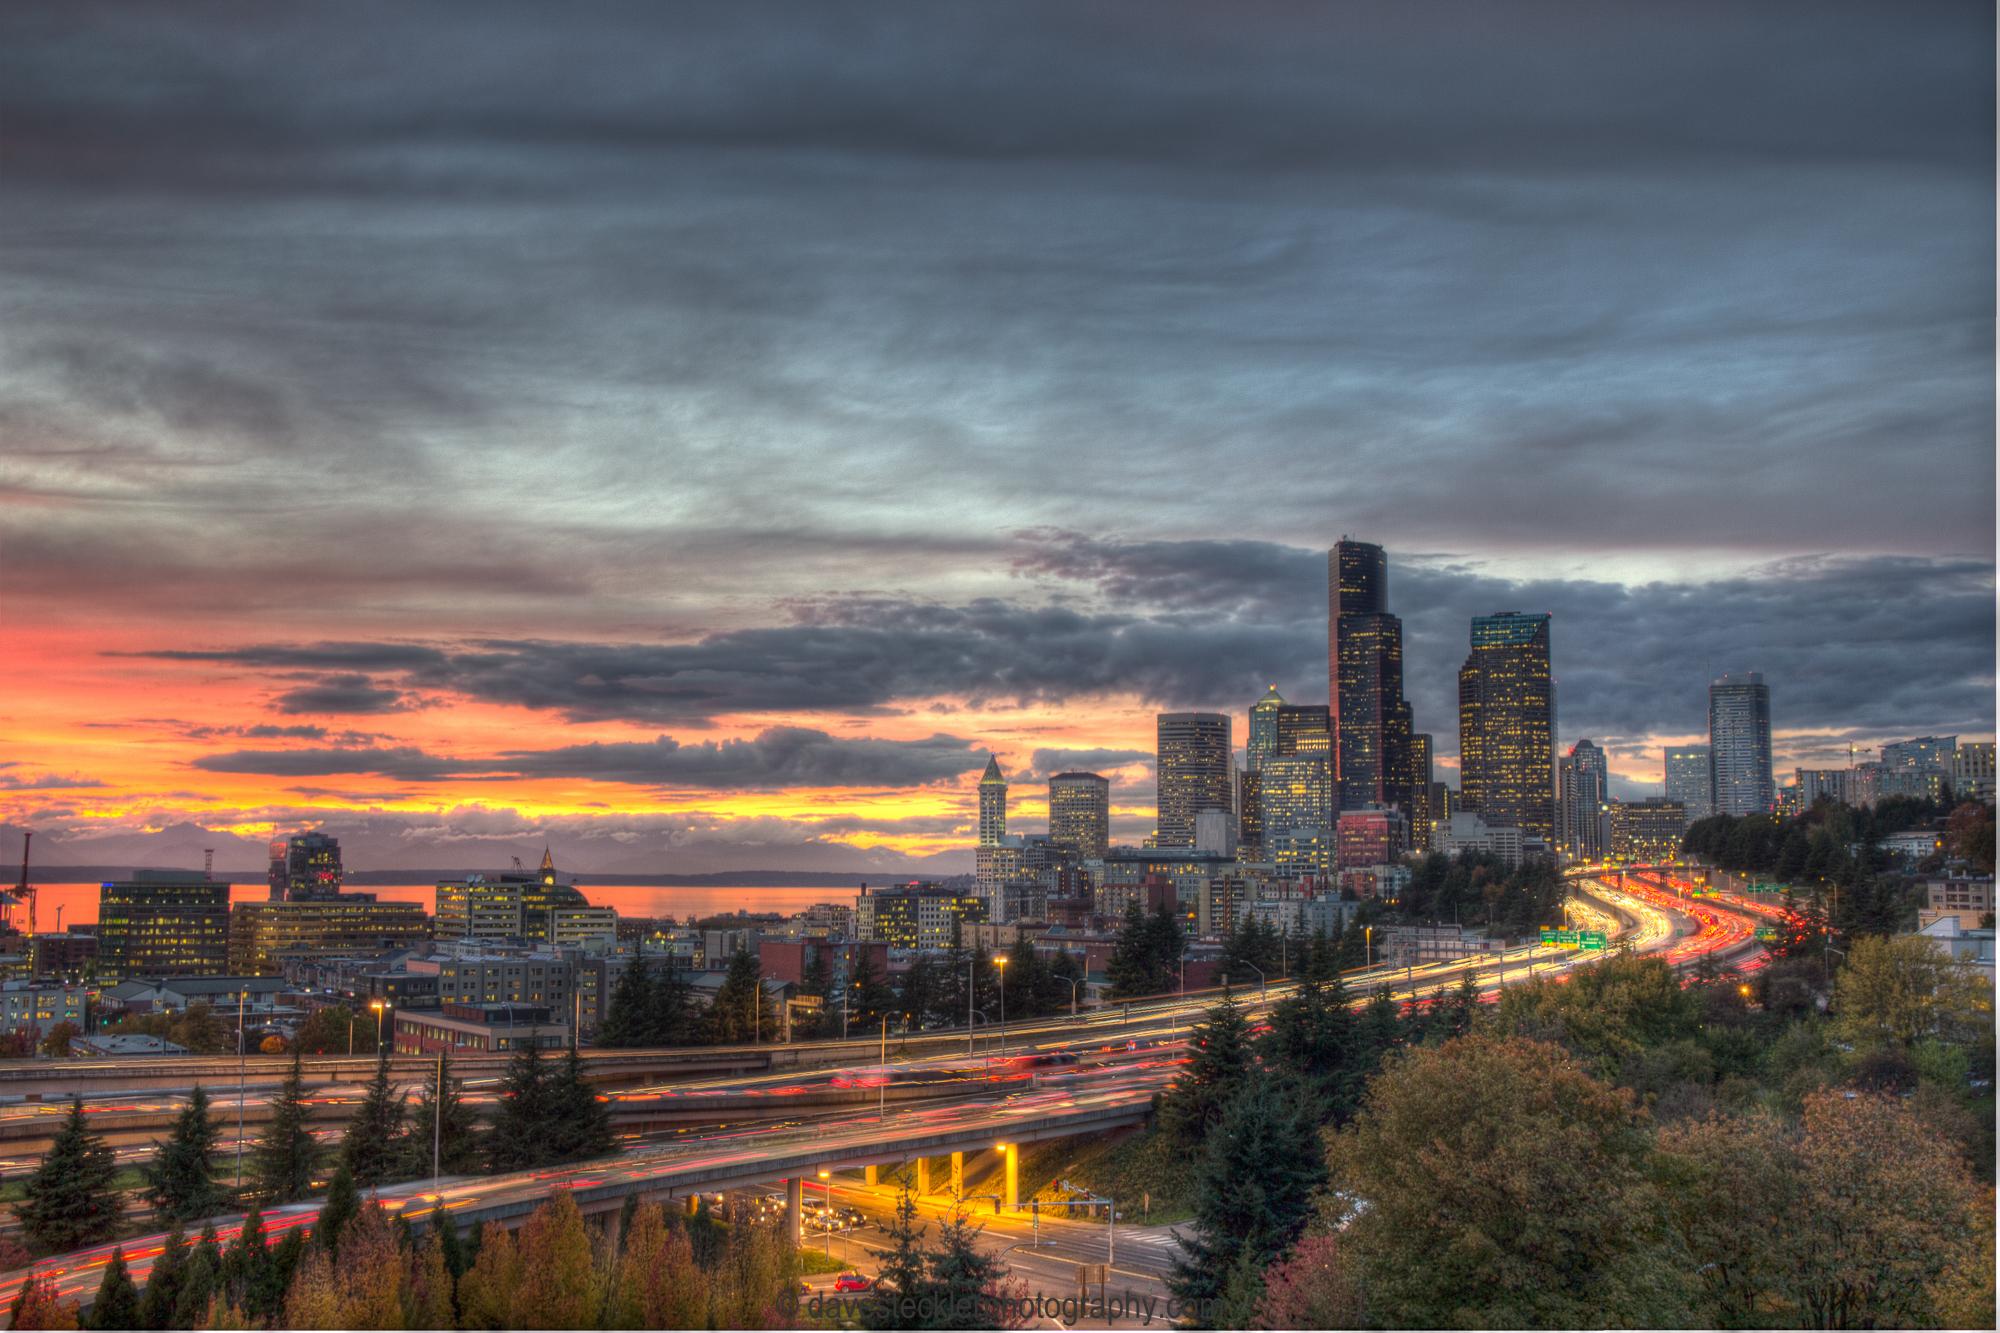 Cityscape Sunset _MG_4780-143_1-144_2-145.jpg